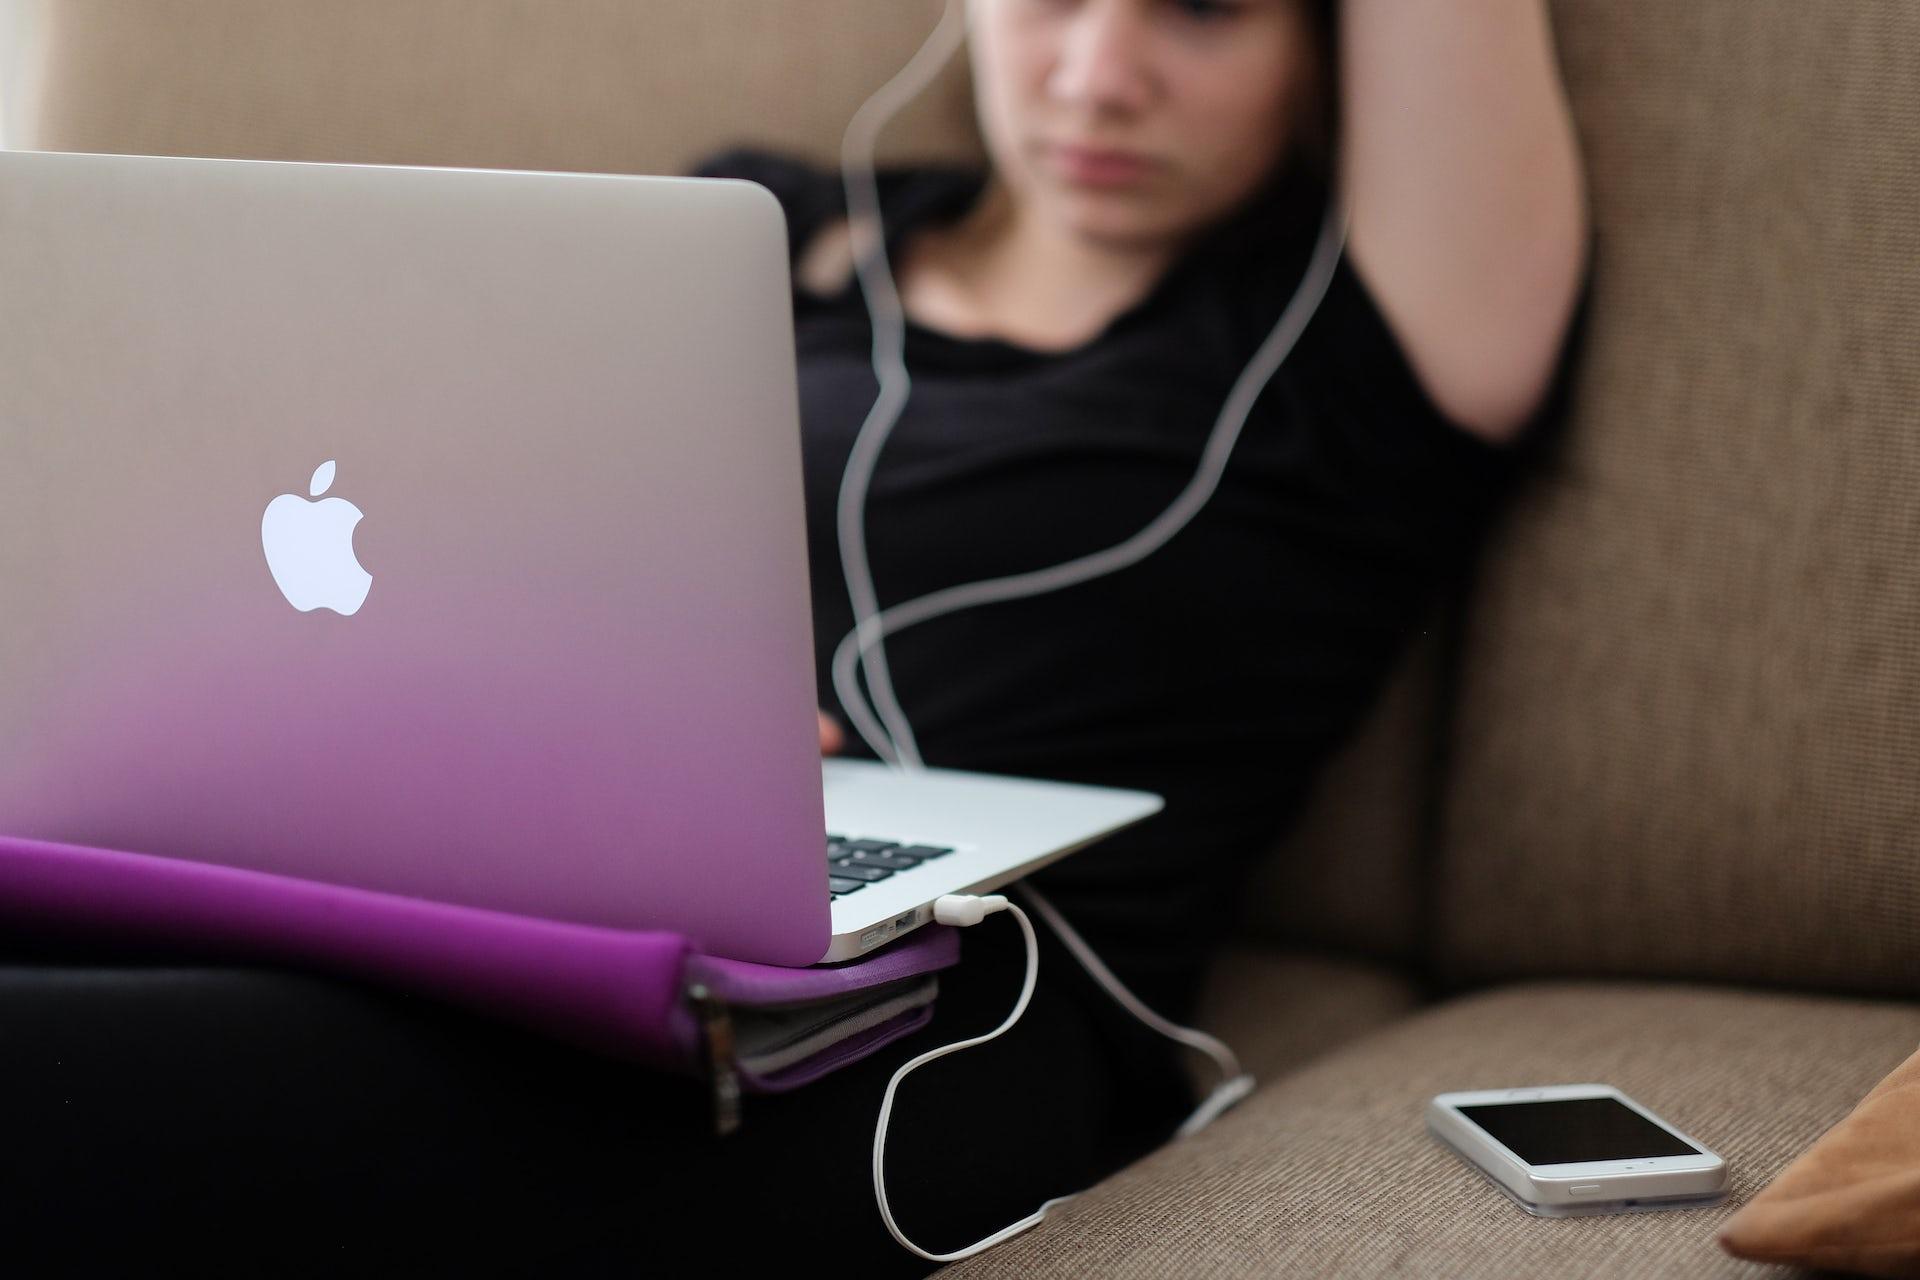 study conducted throgh digital media